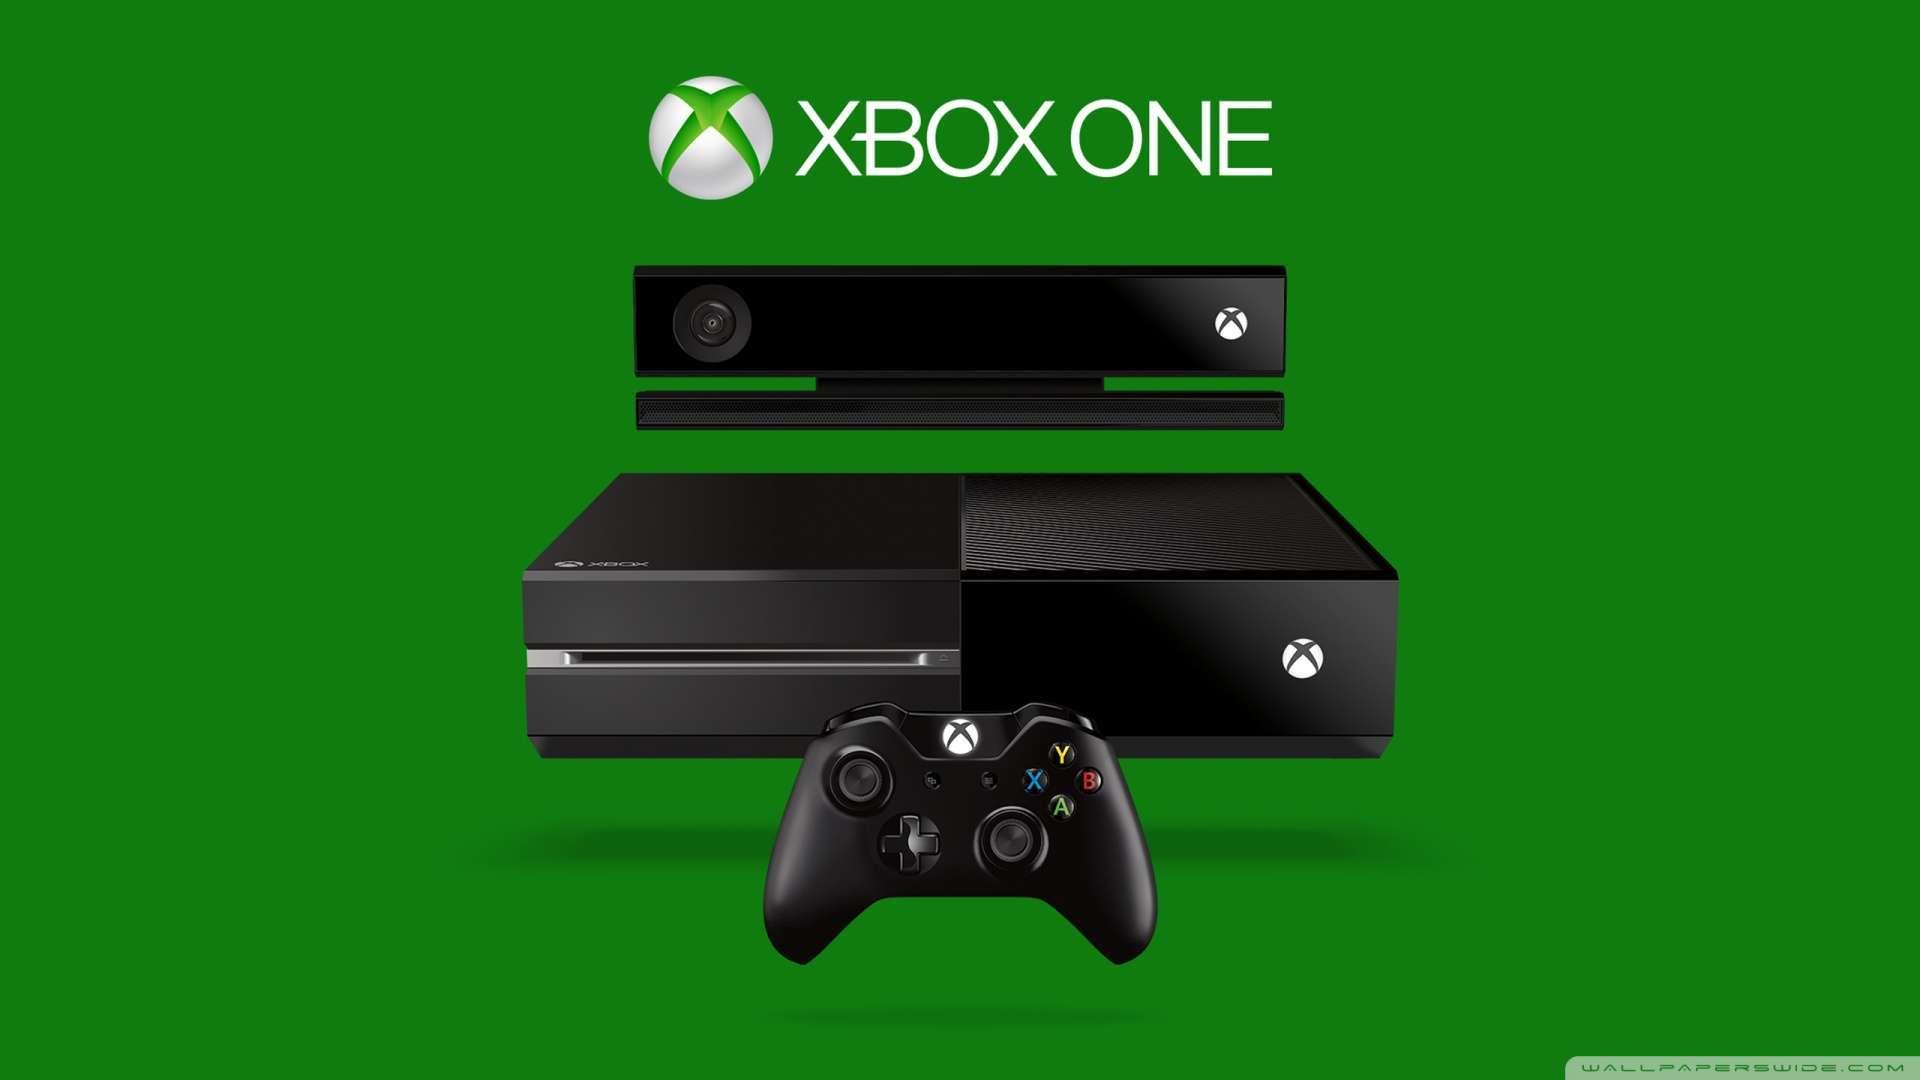 Xbox One Wallpaper 1080p